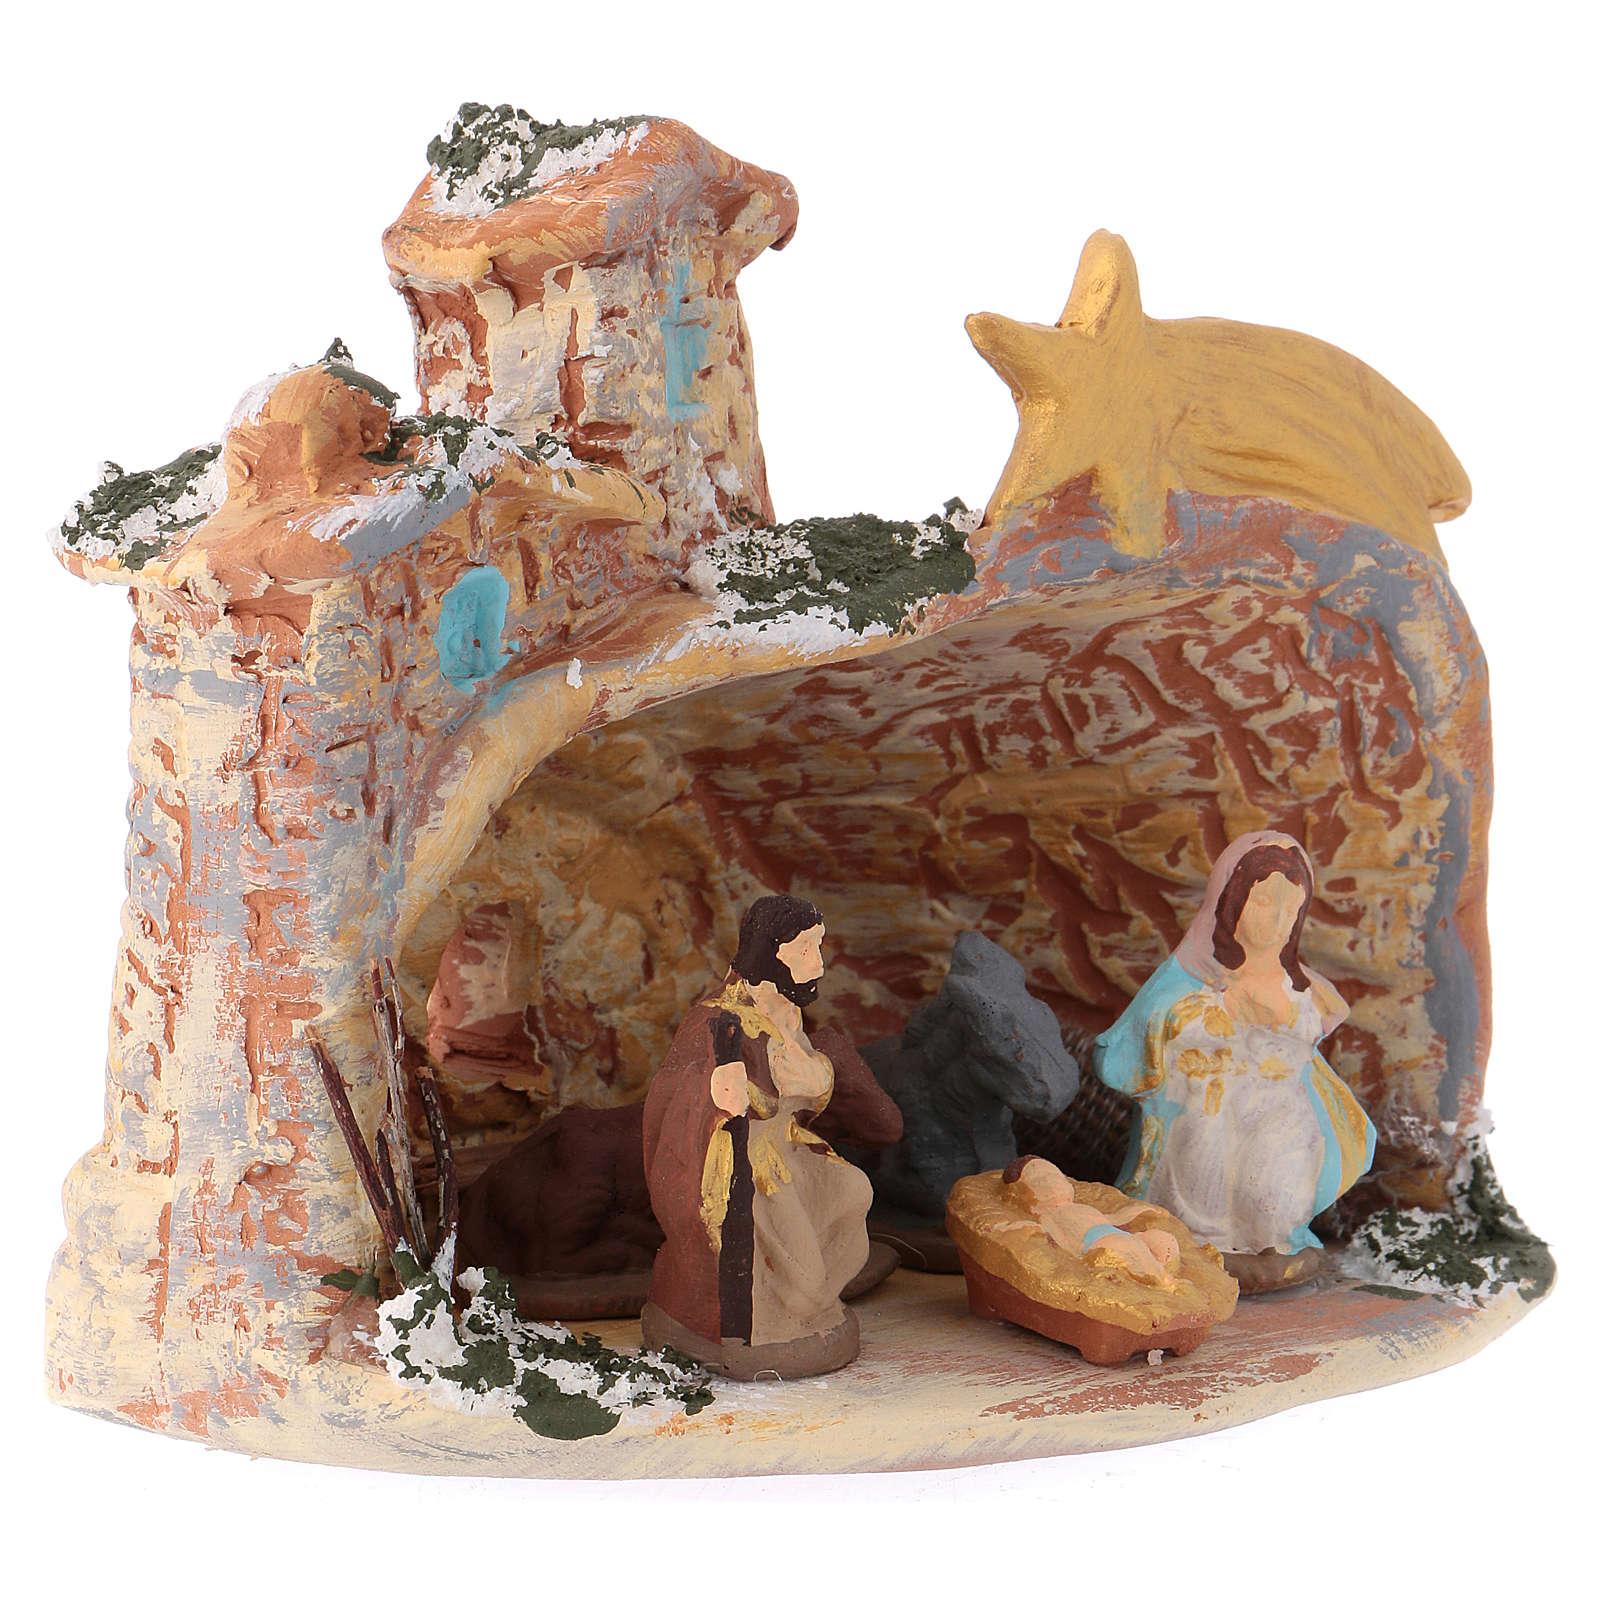 Stable 10x10x10 cm in colored Deruta ceramic with 4 cm nativity 4